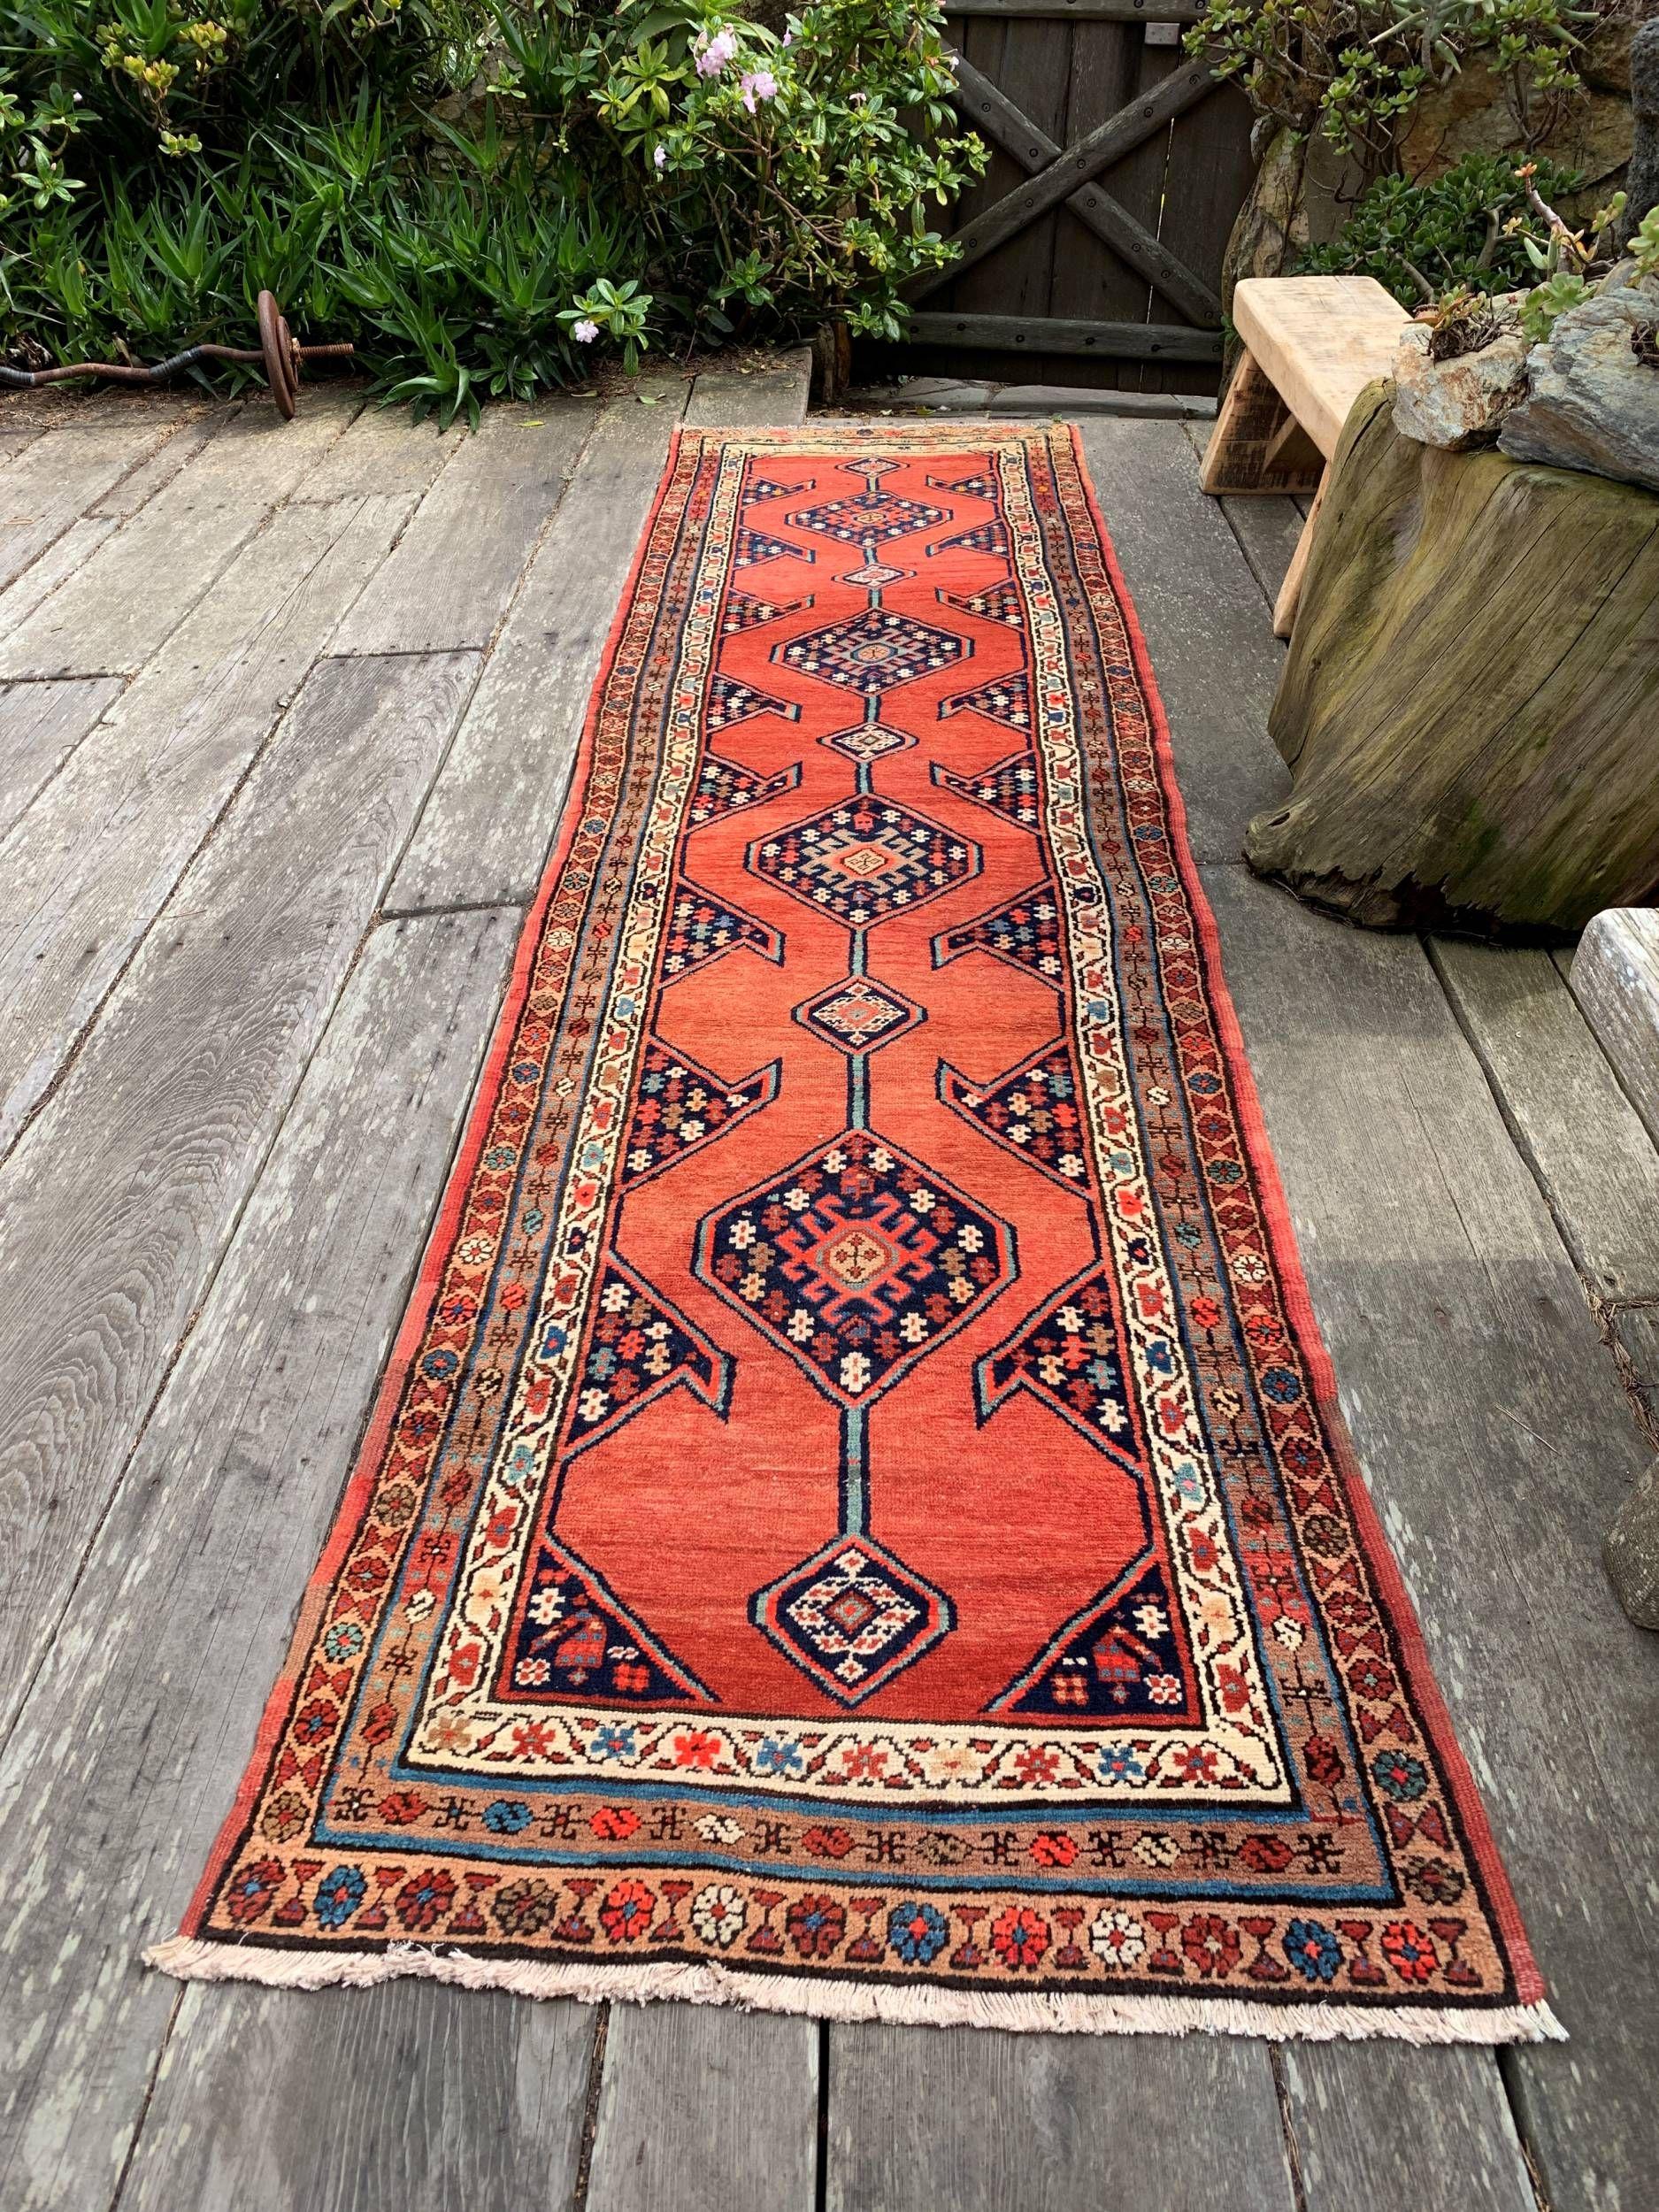 Vintage Persian Runner Rug 3x12 Coral And Navy Dream Persian Rug Runners Boho Carpet Bohemian Rug Rug Runner